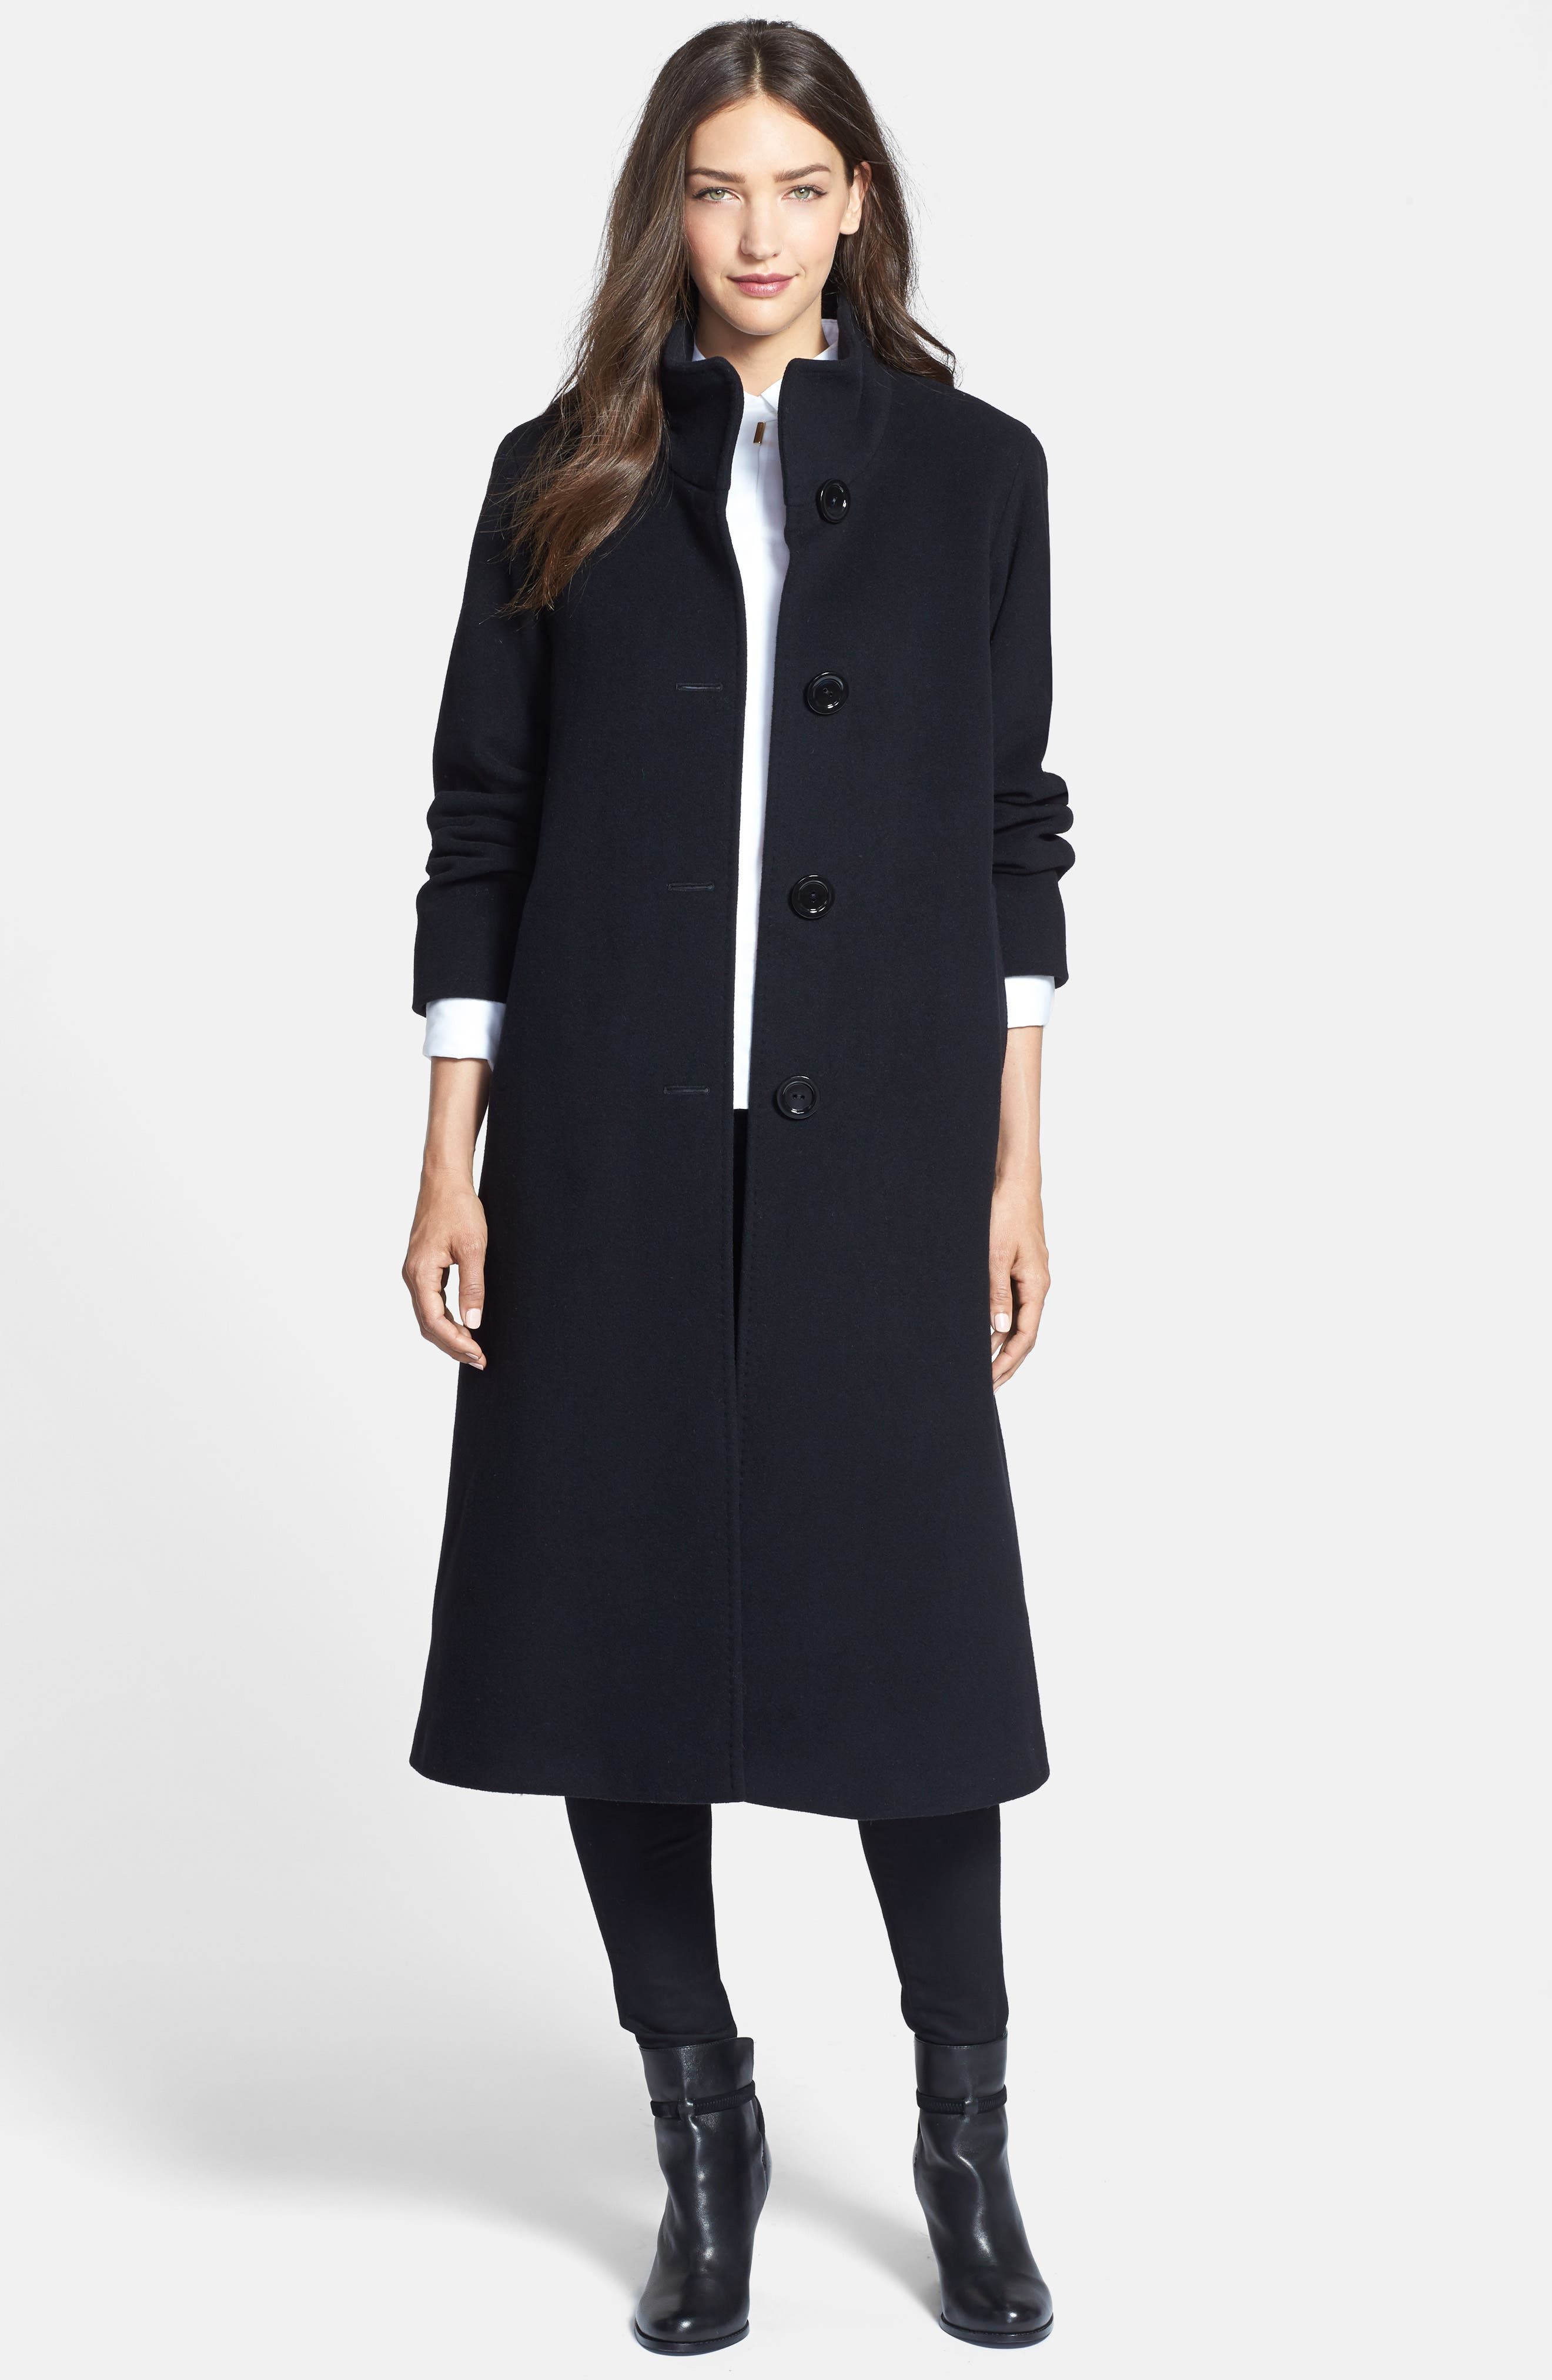 Main Image - Cinzia Rocca DUE Stand Collar Side Slit Long Coat (Regular & Petite)